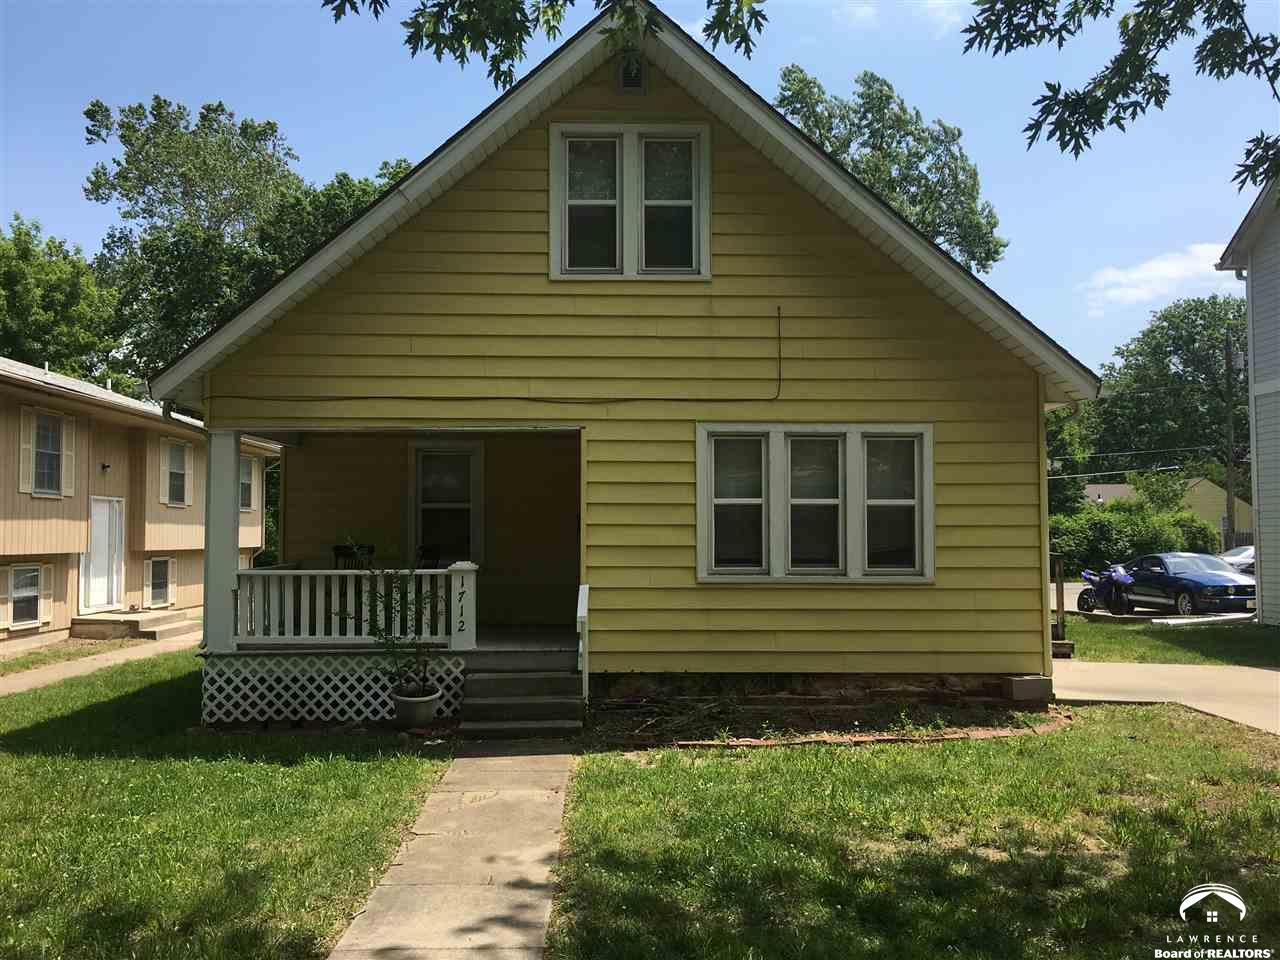 1712 Kentucky, Lawrence, KS 66044